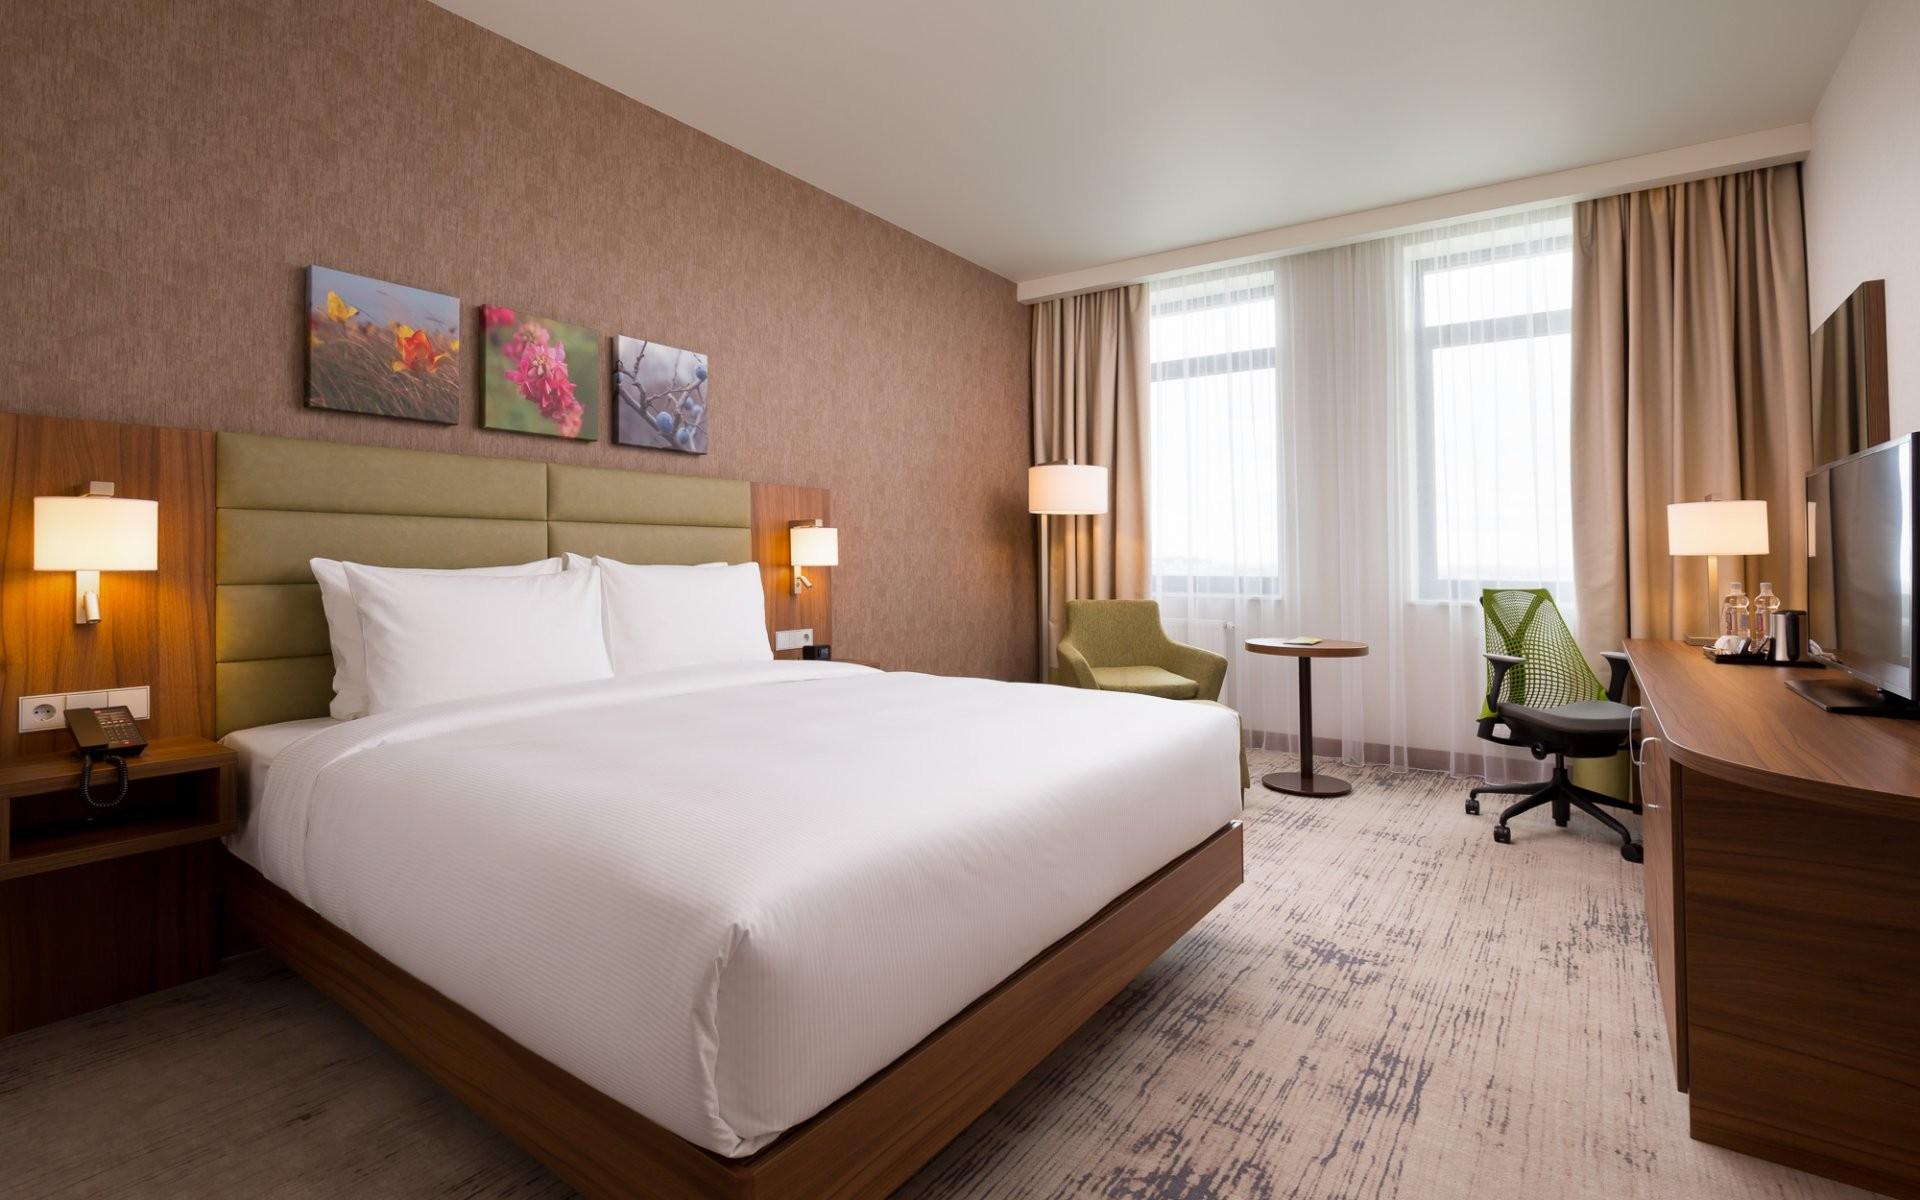 Hilton Garden Inn Orenburg, отель - №1